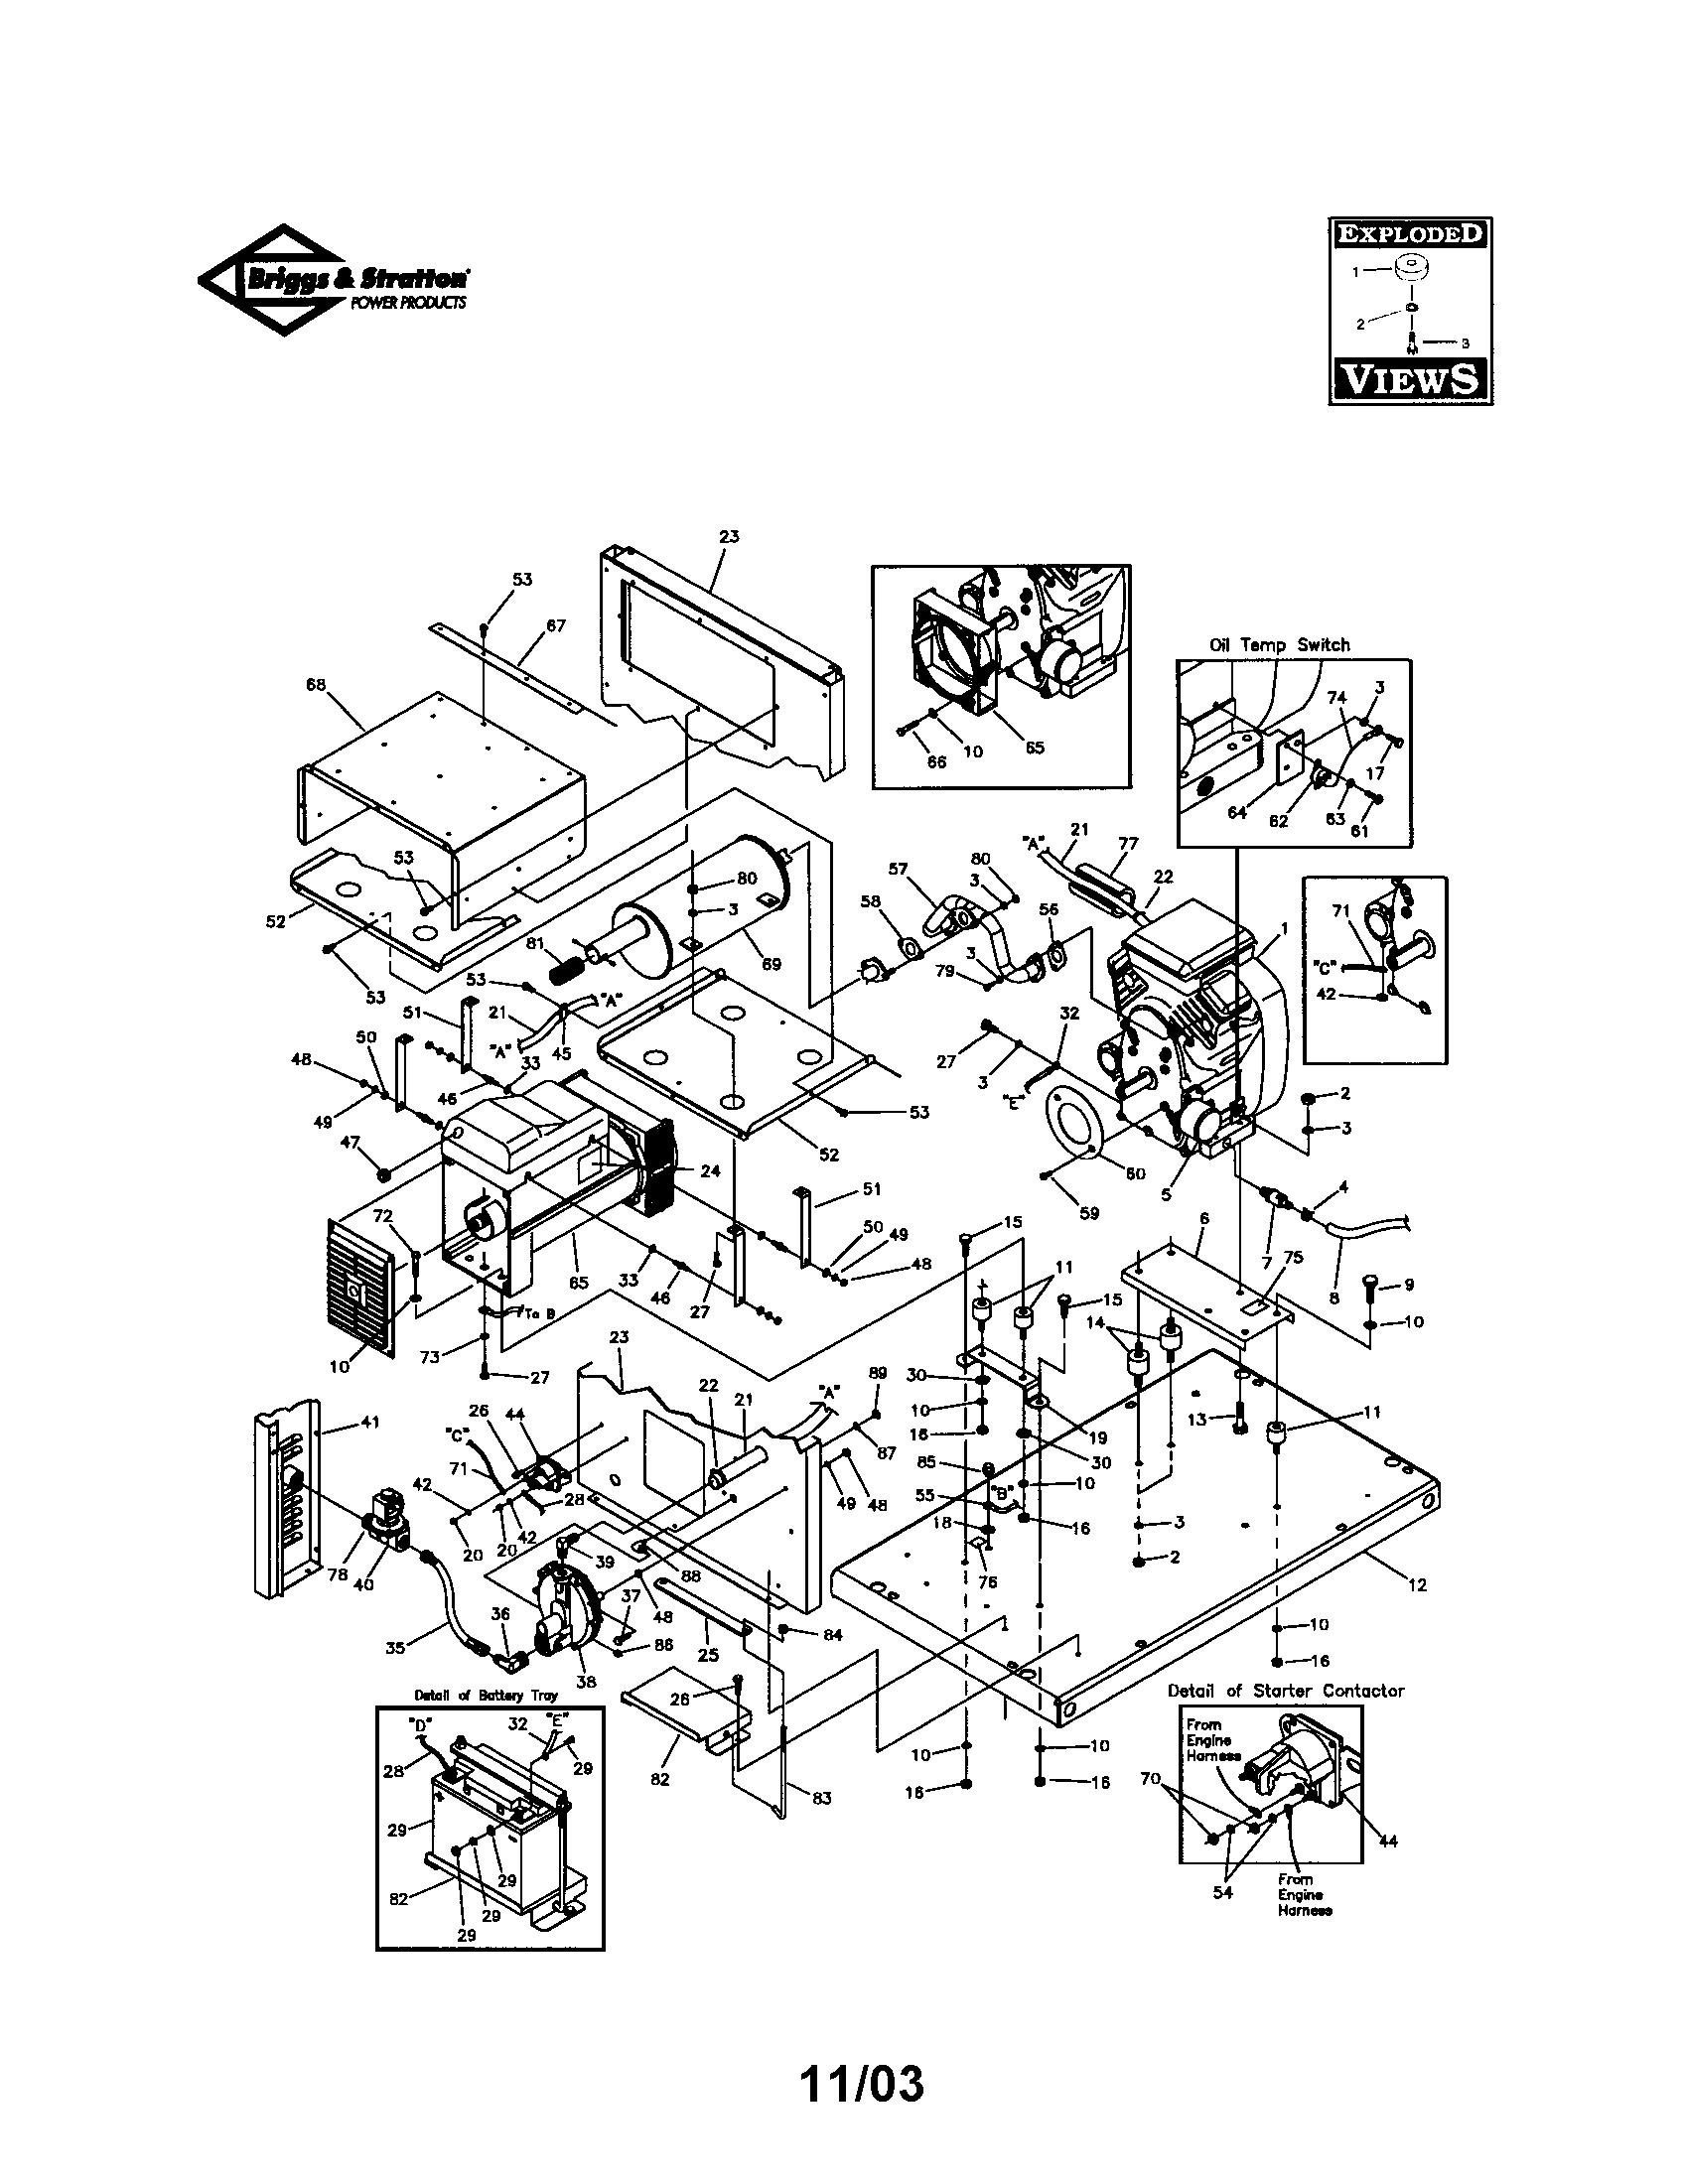 Briggs-Stratton model 01931-0 generator genuine parts